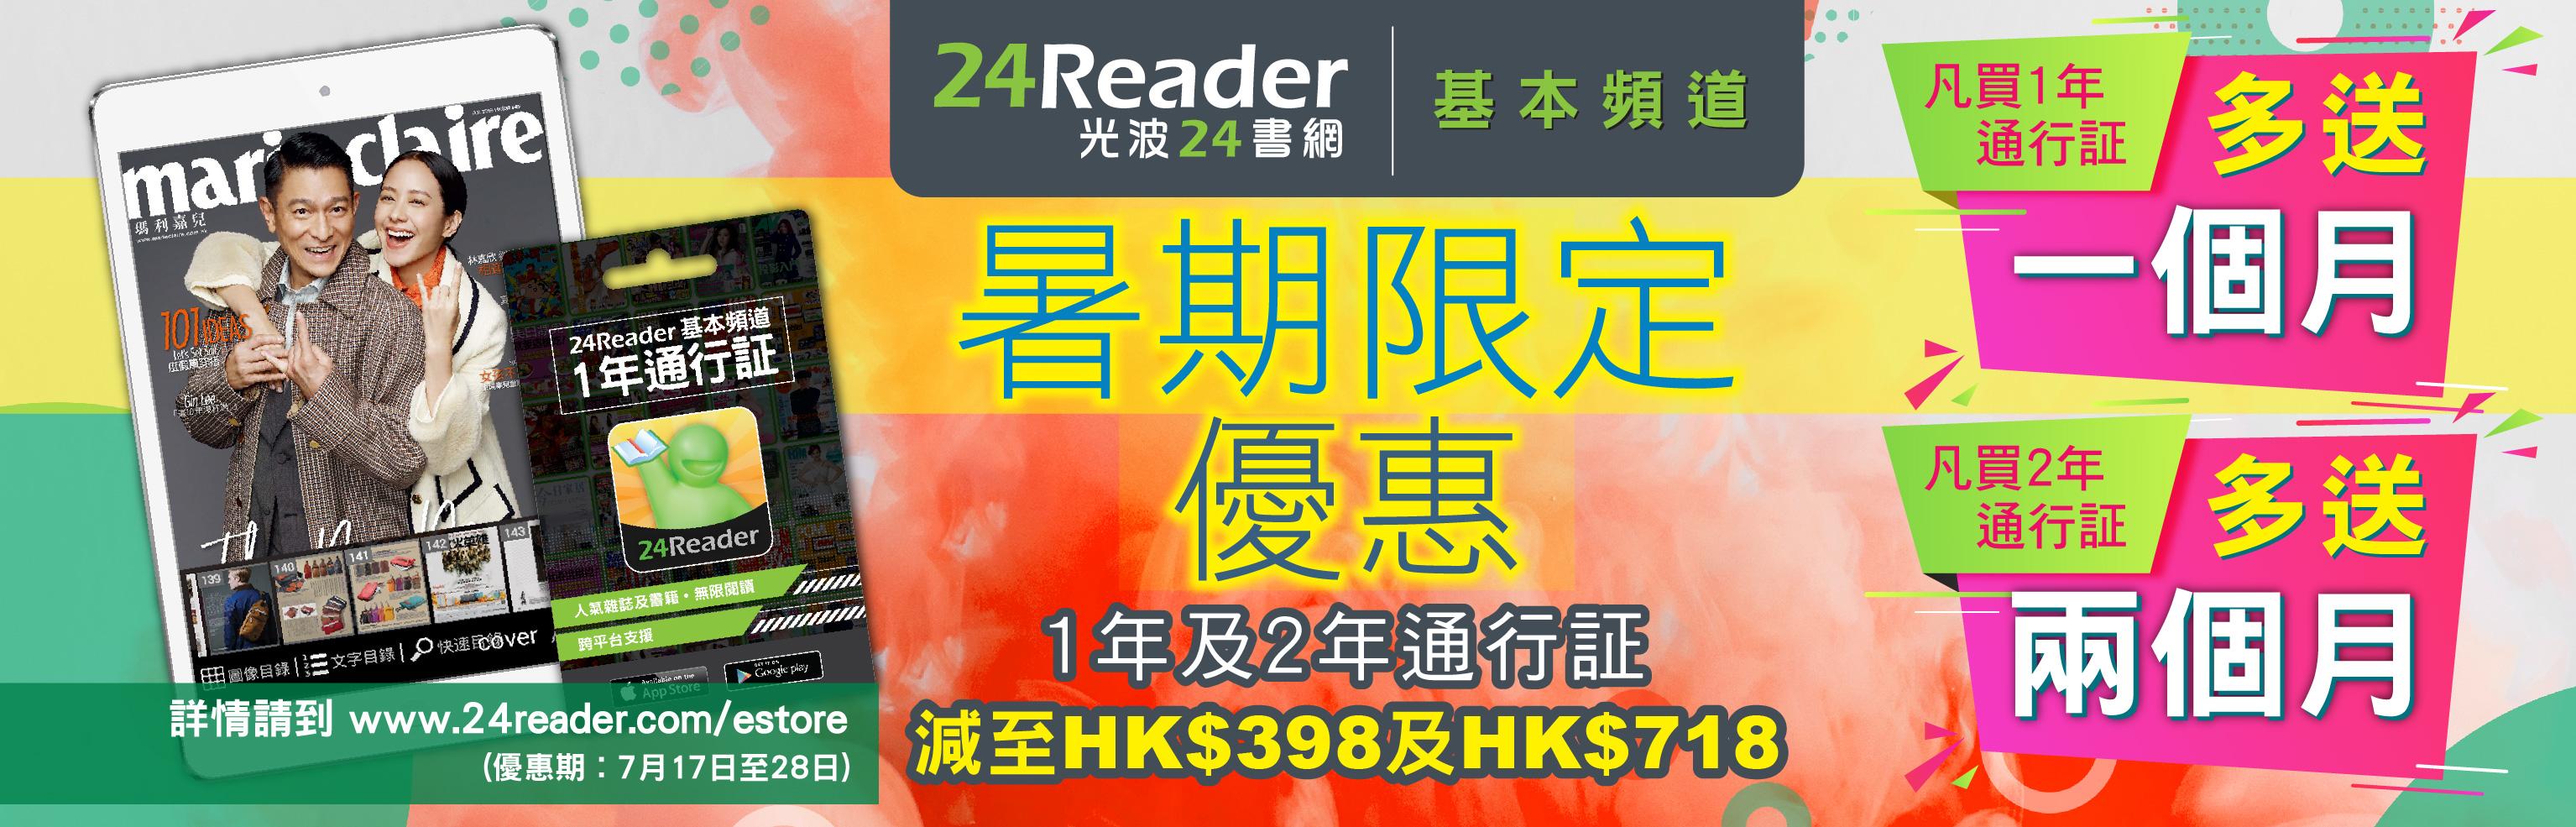 24Reader基本頻道 暑期限定優惠